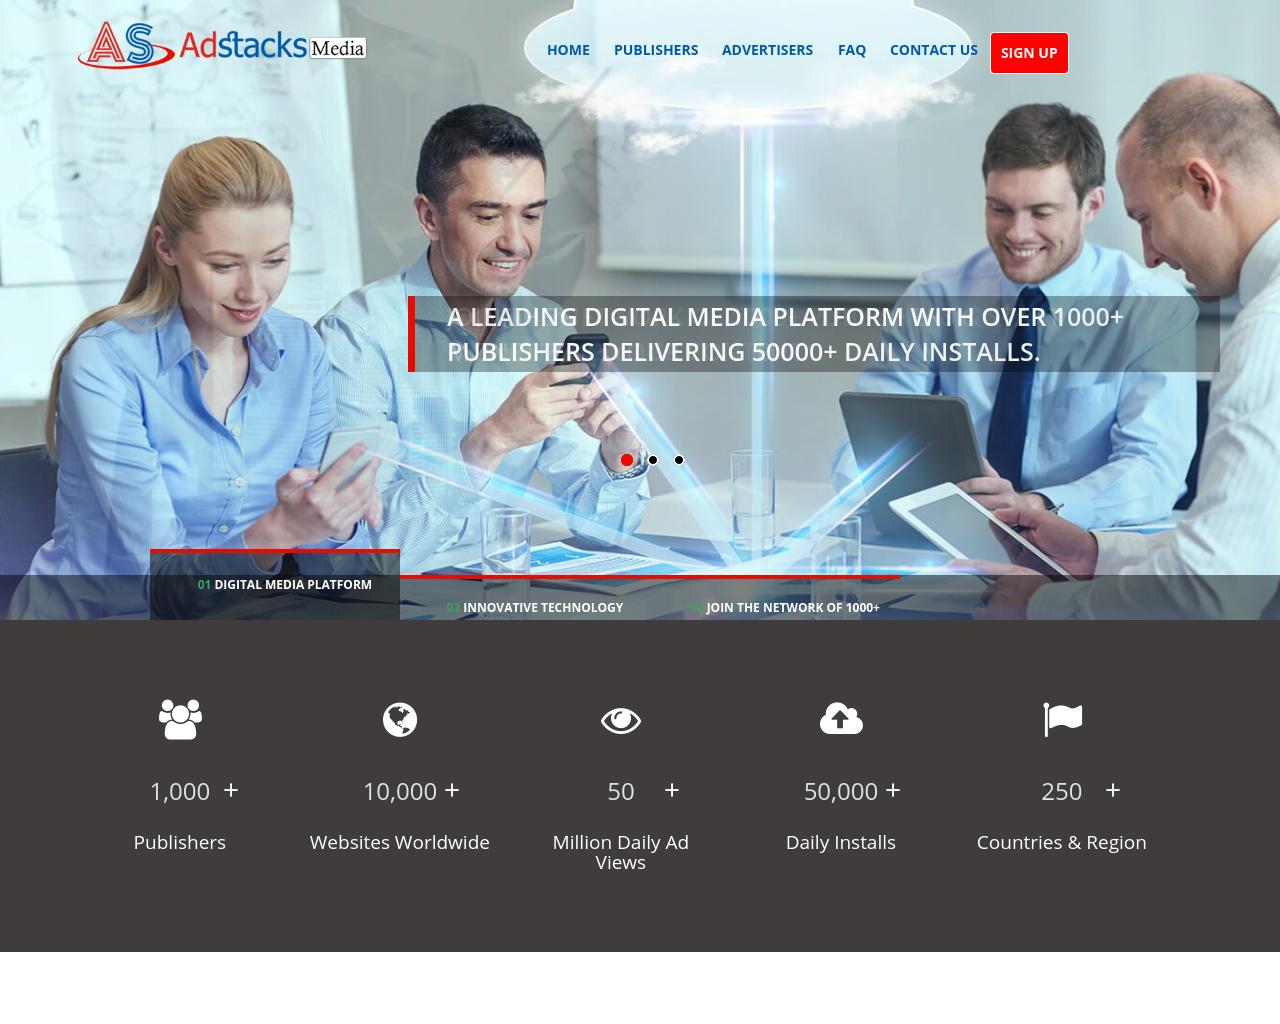 Adstacks-Media-Advertising-Reviews-Pricing